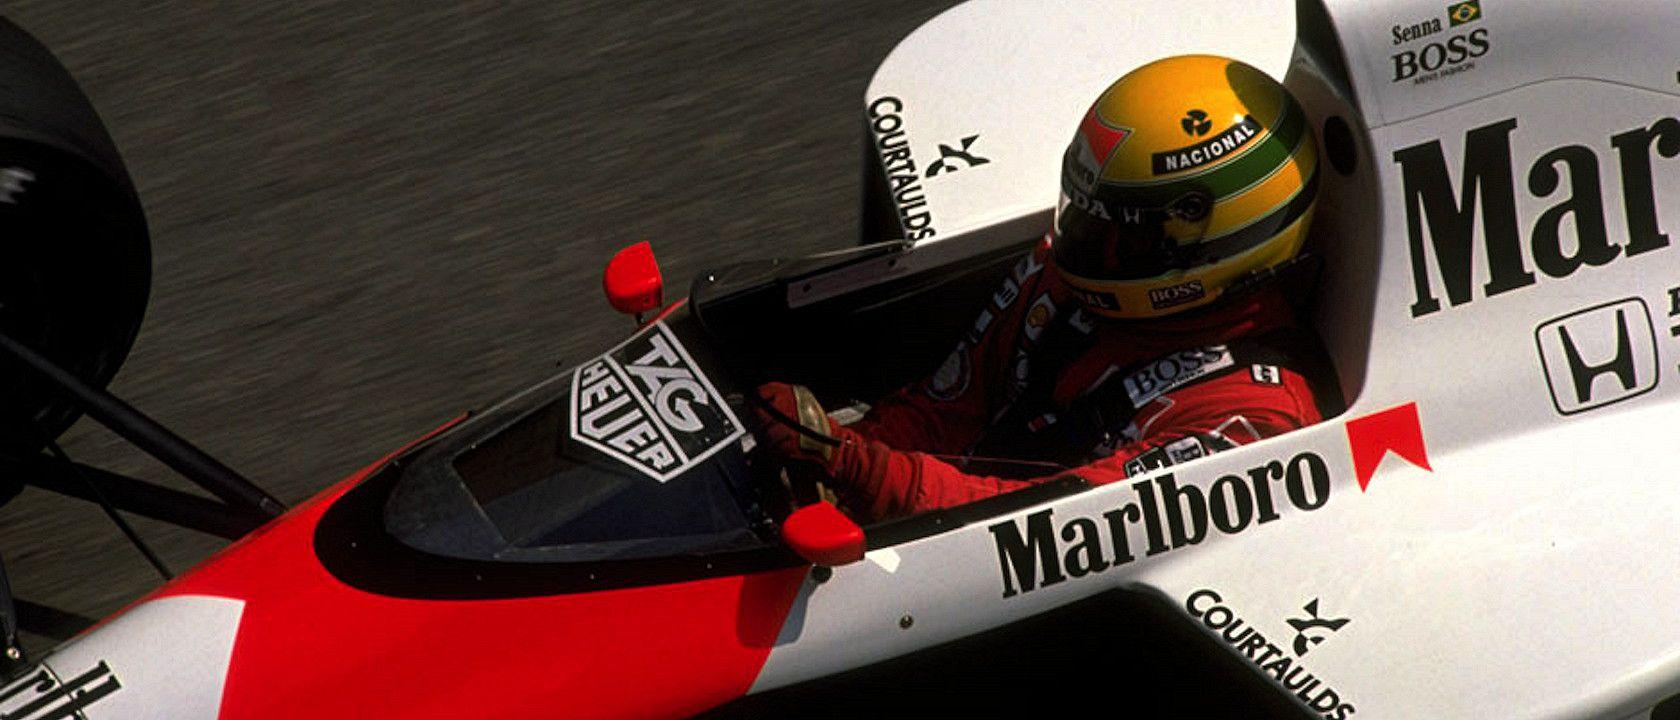 Ayrton Senna and his legendary Monaco '88 qualifying lap